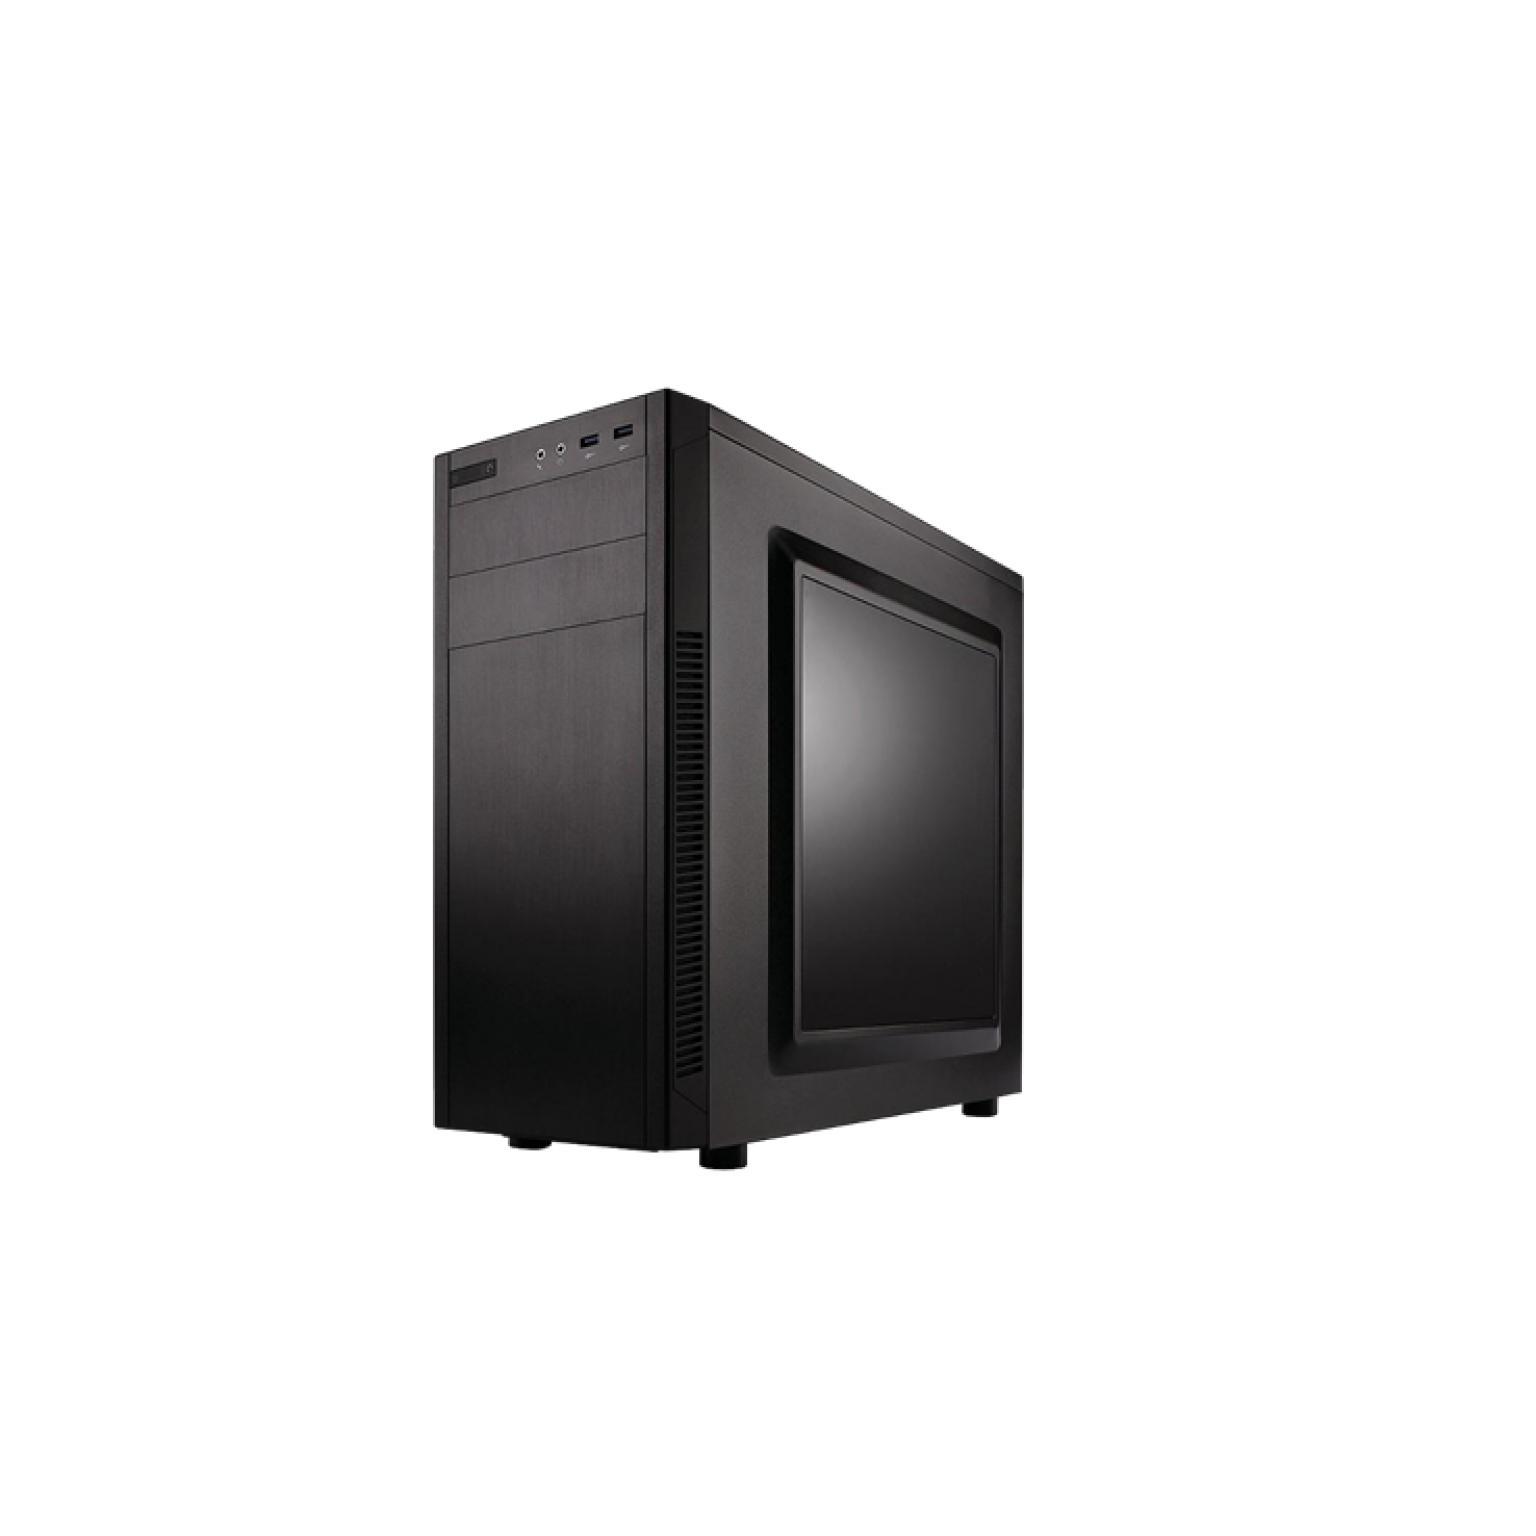 RV-WS0960